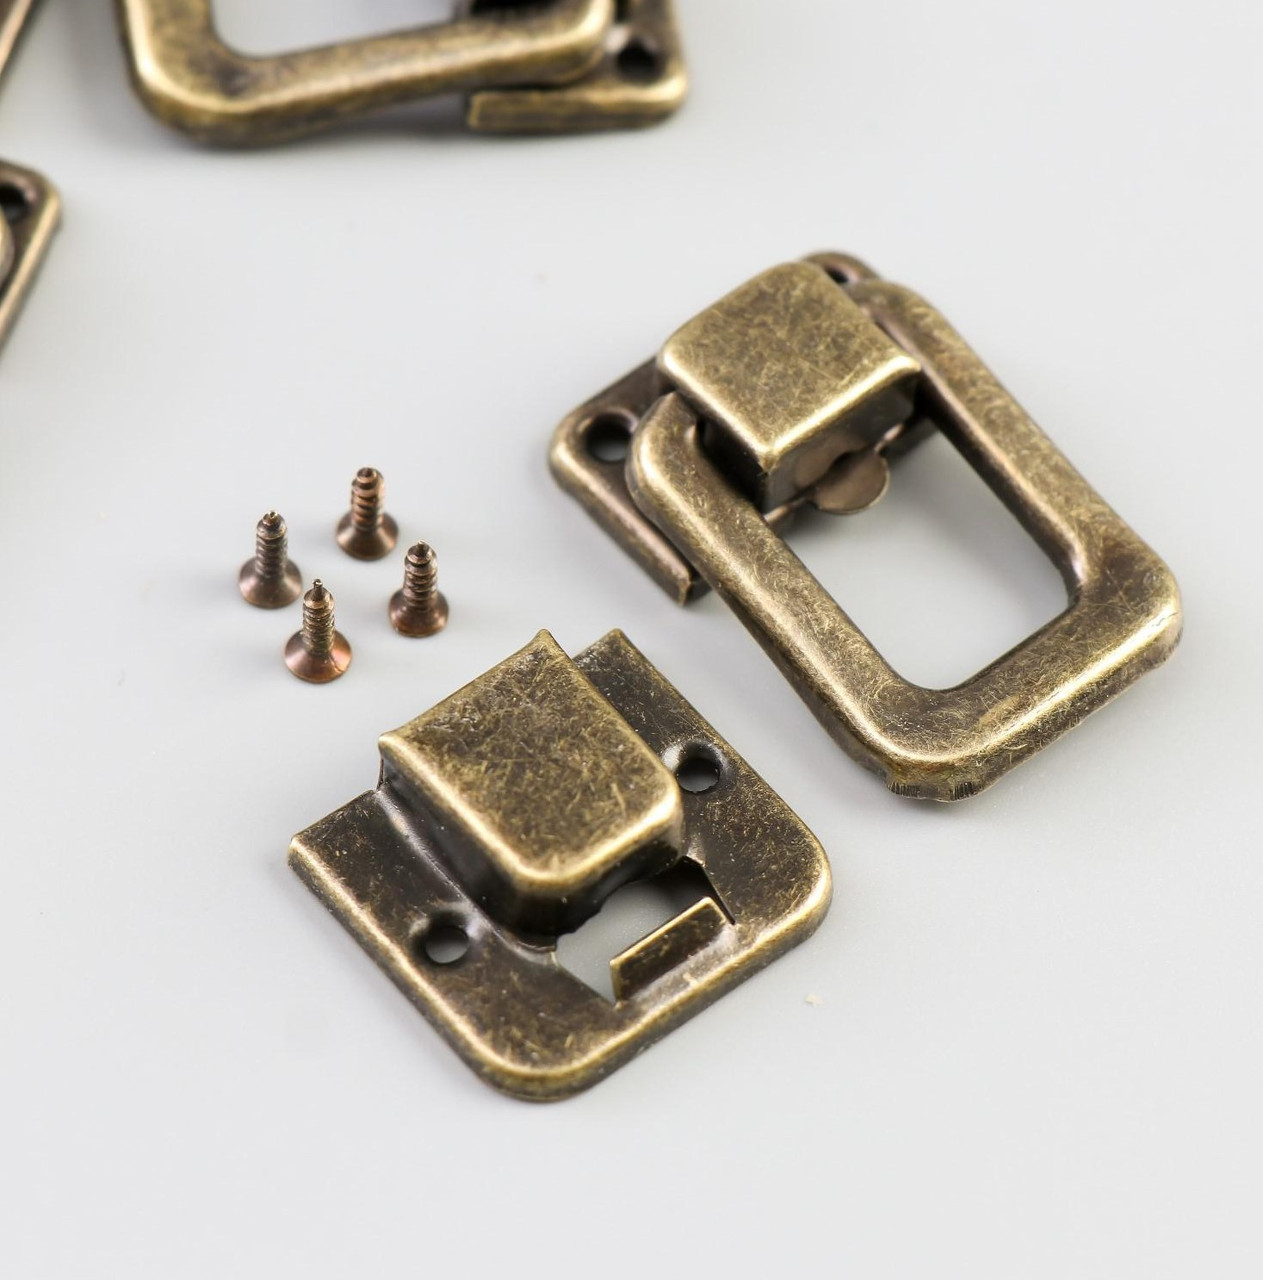 Замок металл для шкатулки бронза + гвозд. набор 5 шт 3,6х2,5 см